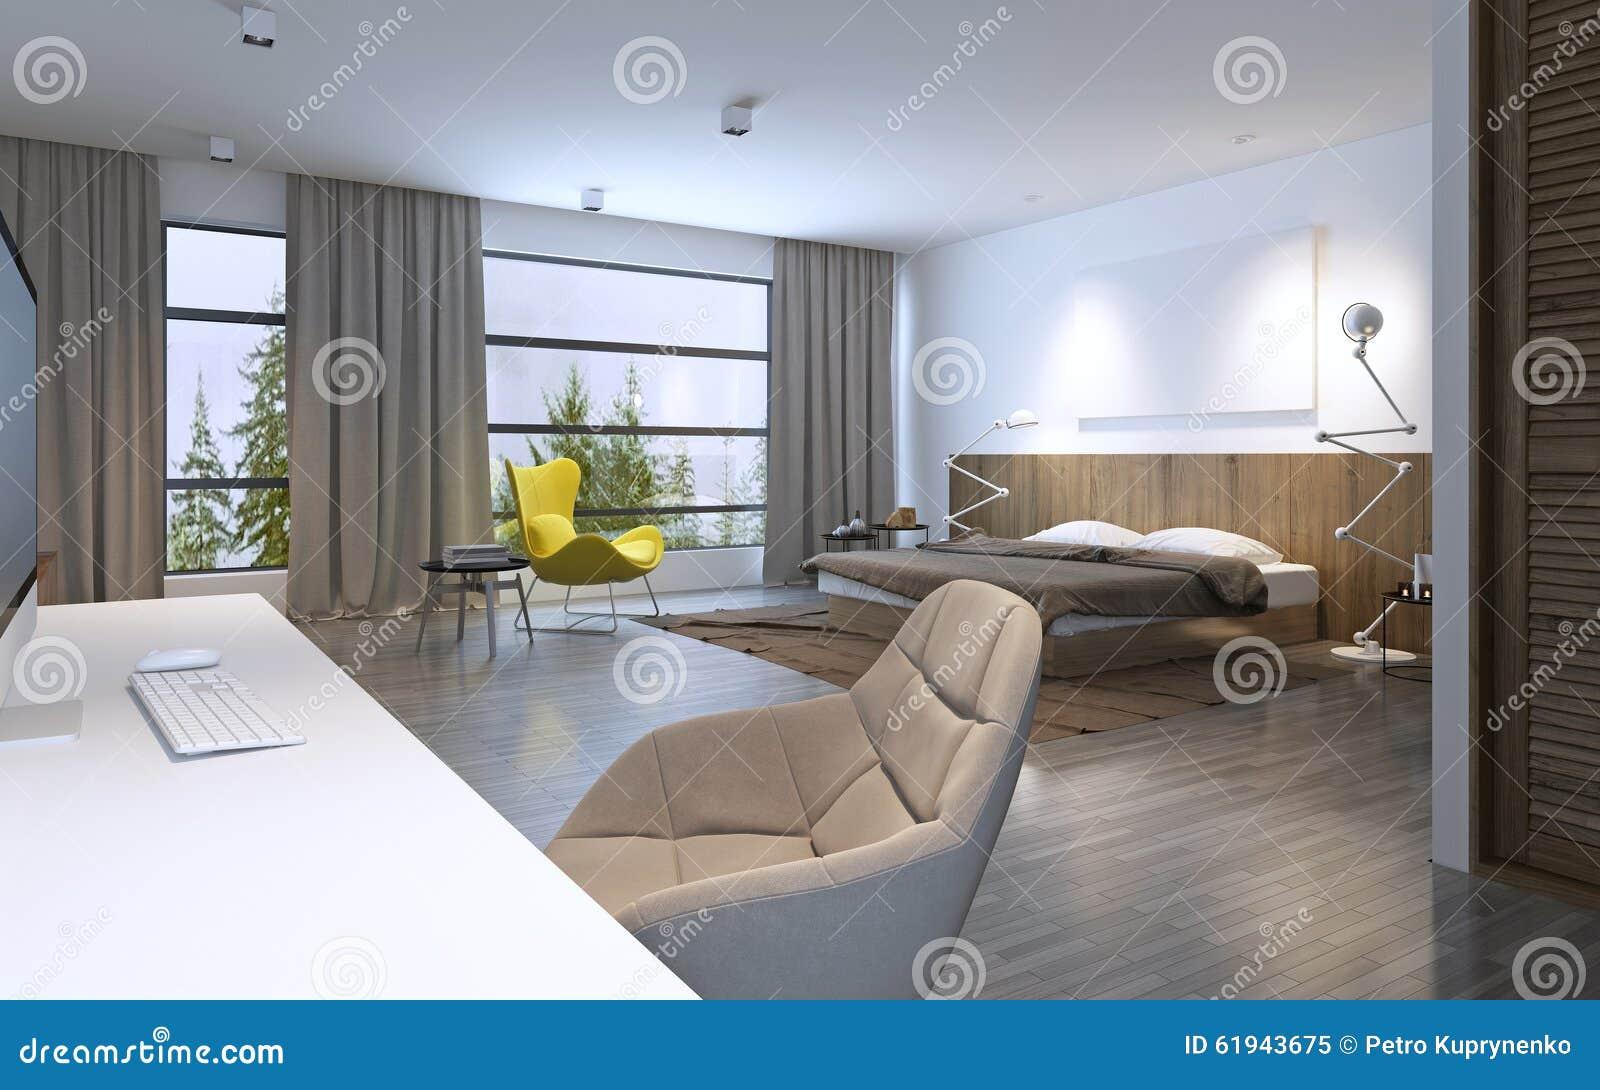 Ruime slaapkamer moderne stijl stock illustratie afbeelding 61943675 - Kamer deco stijl ...